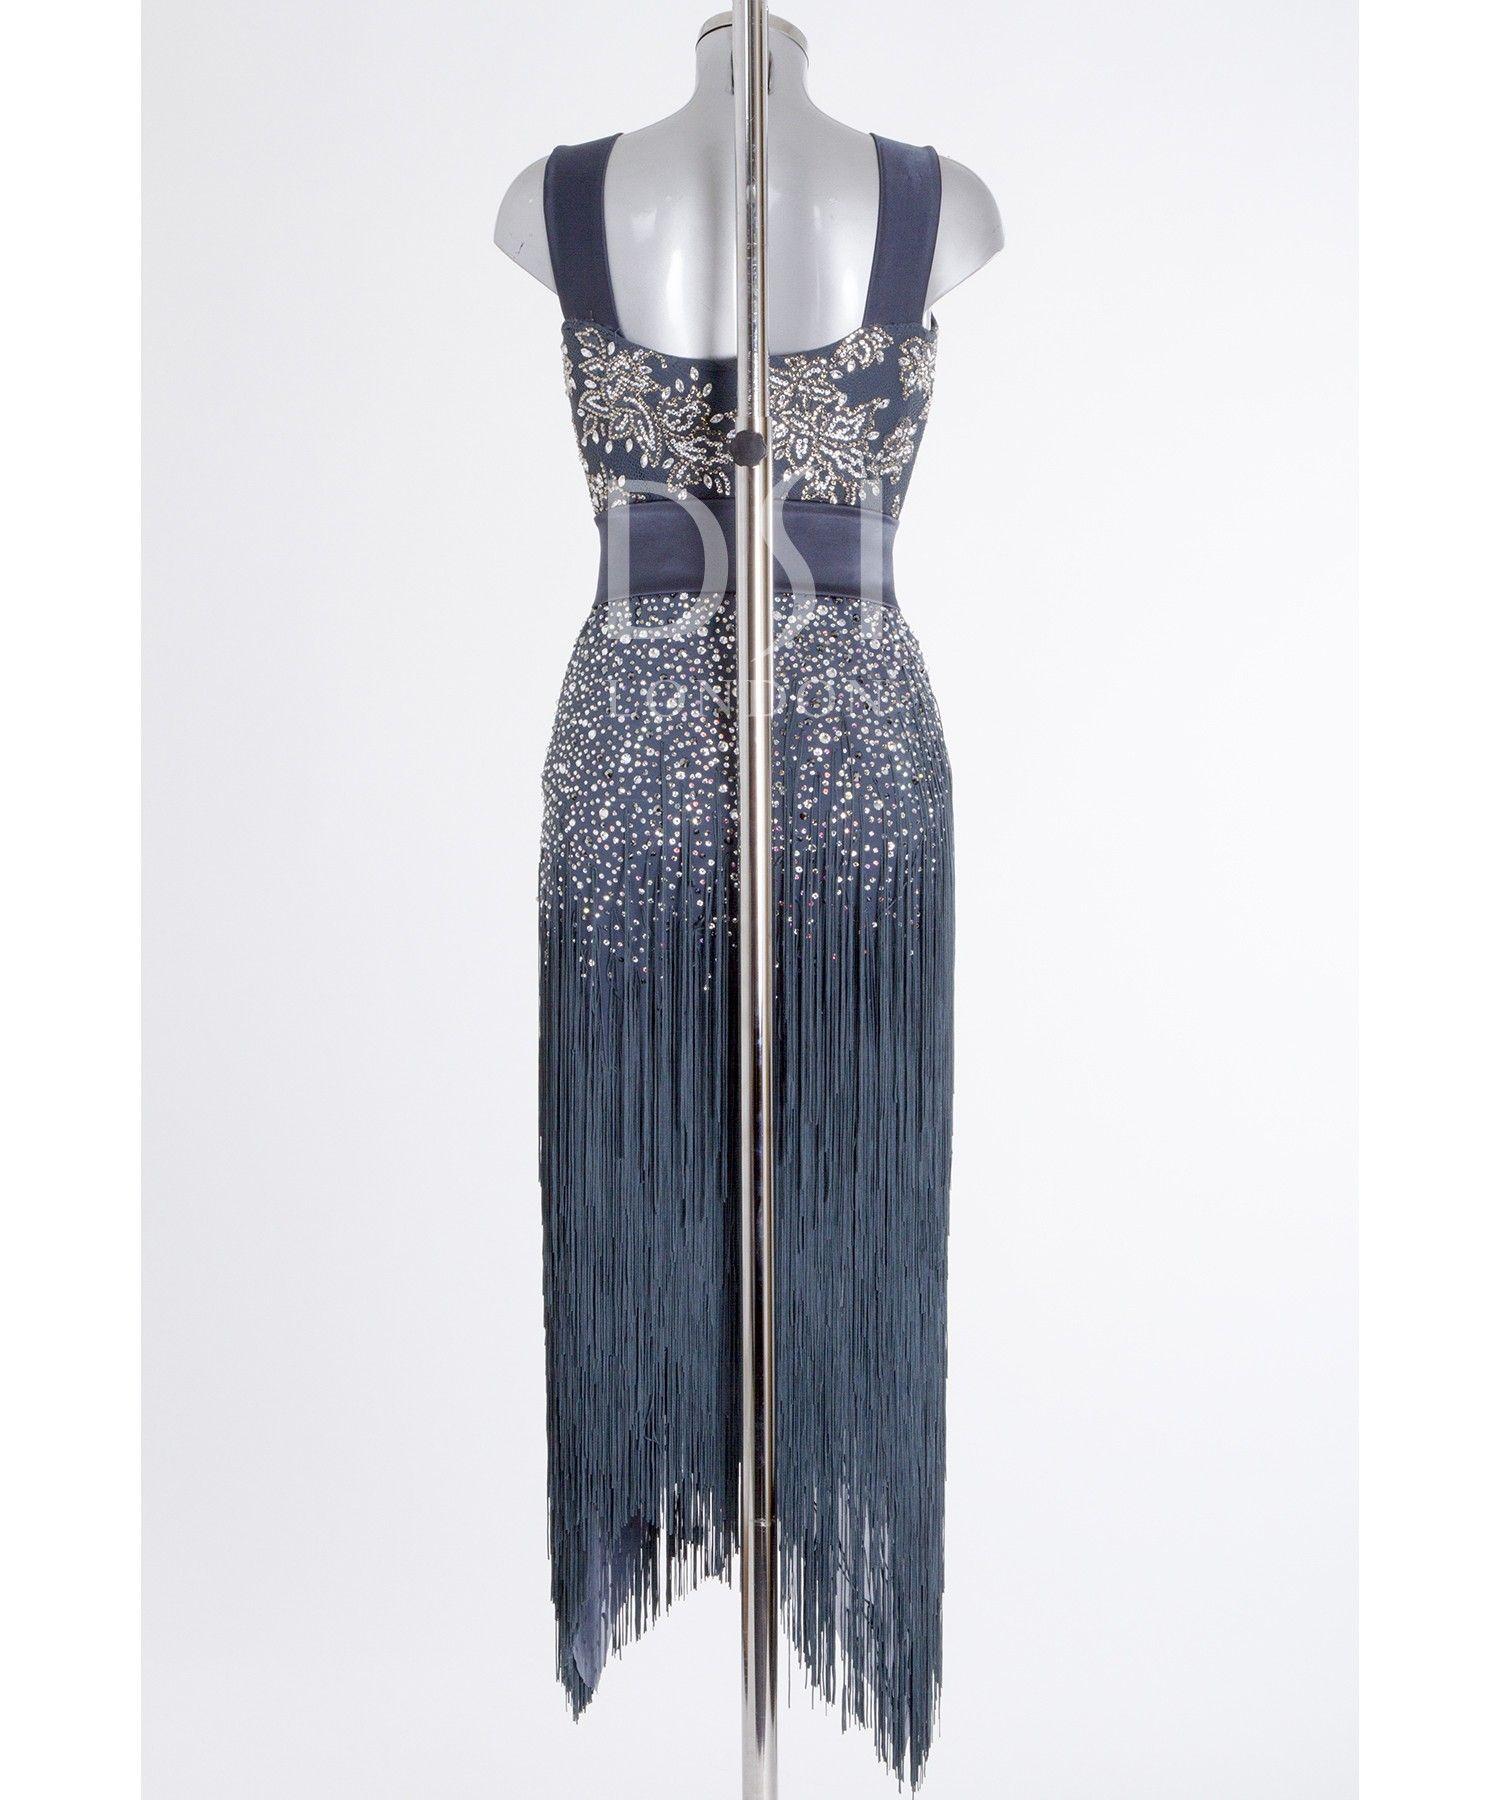 393539 Hematite Latin Dress | Latin dresses for sale ...